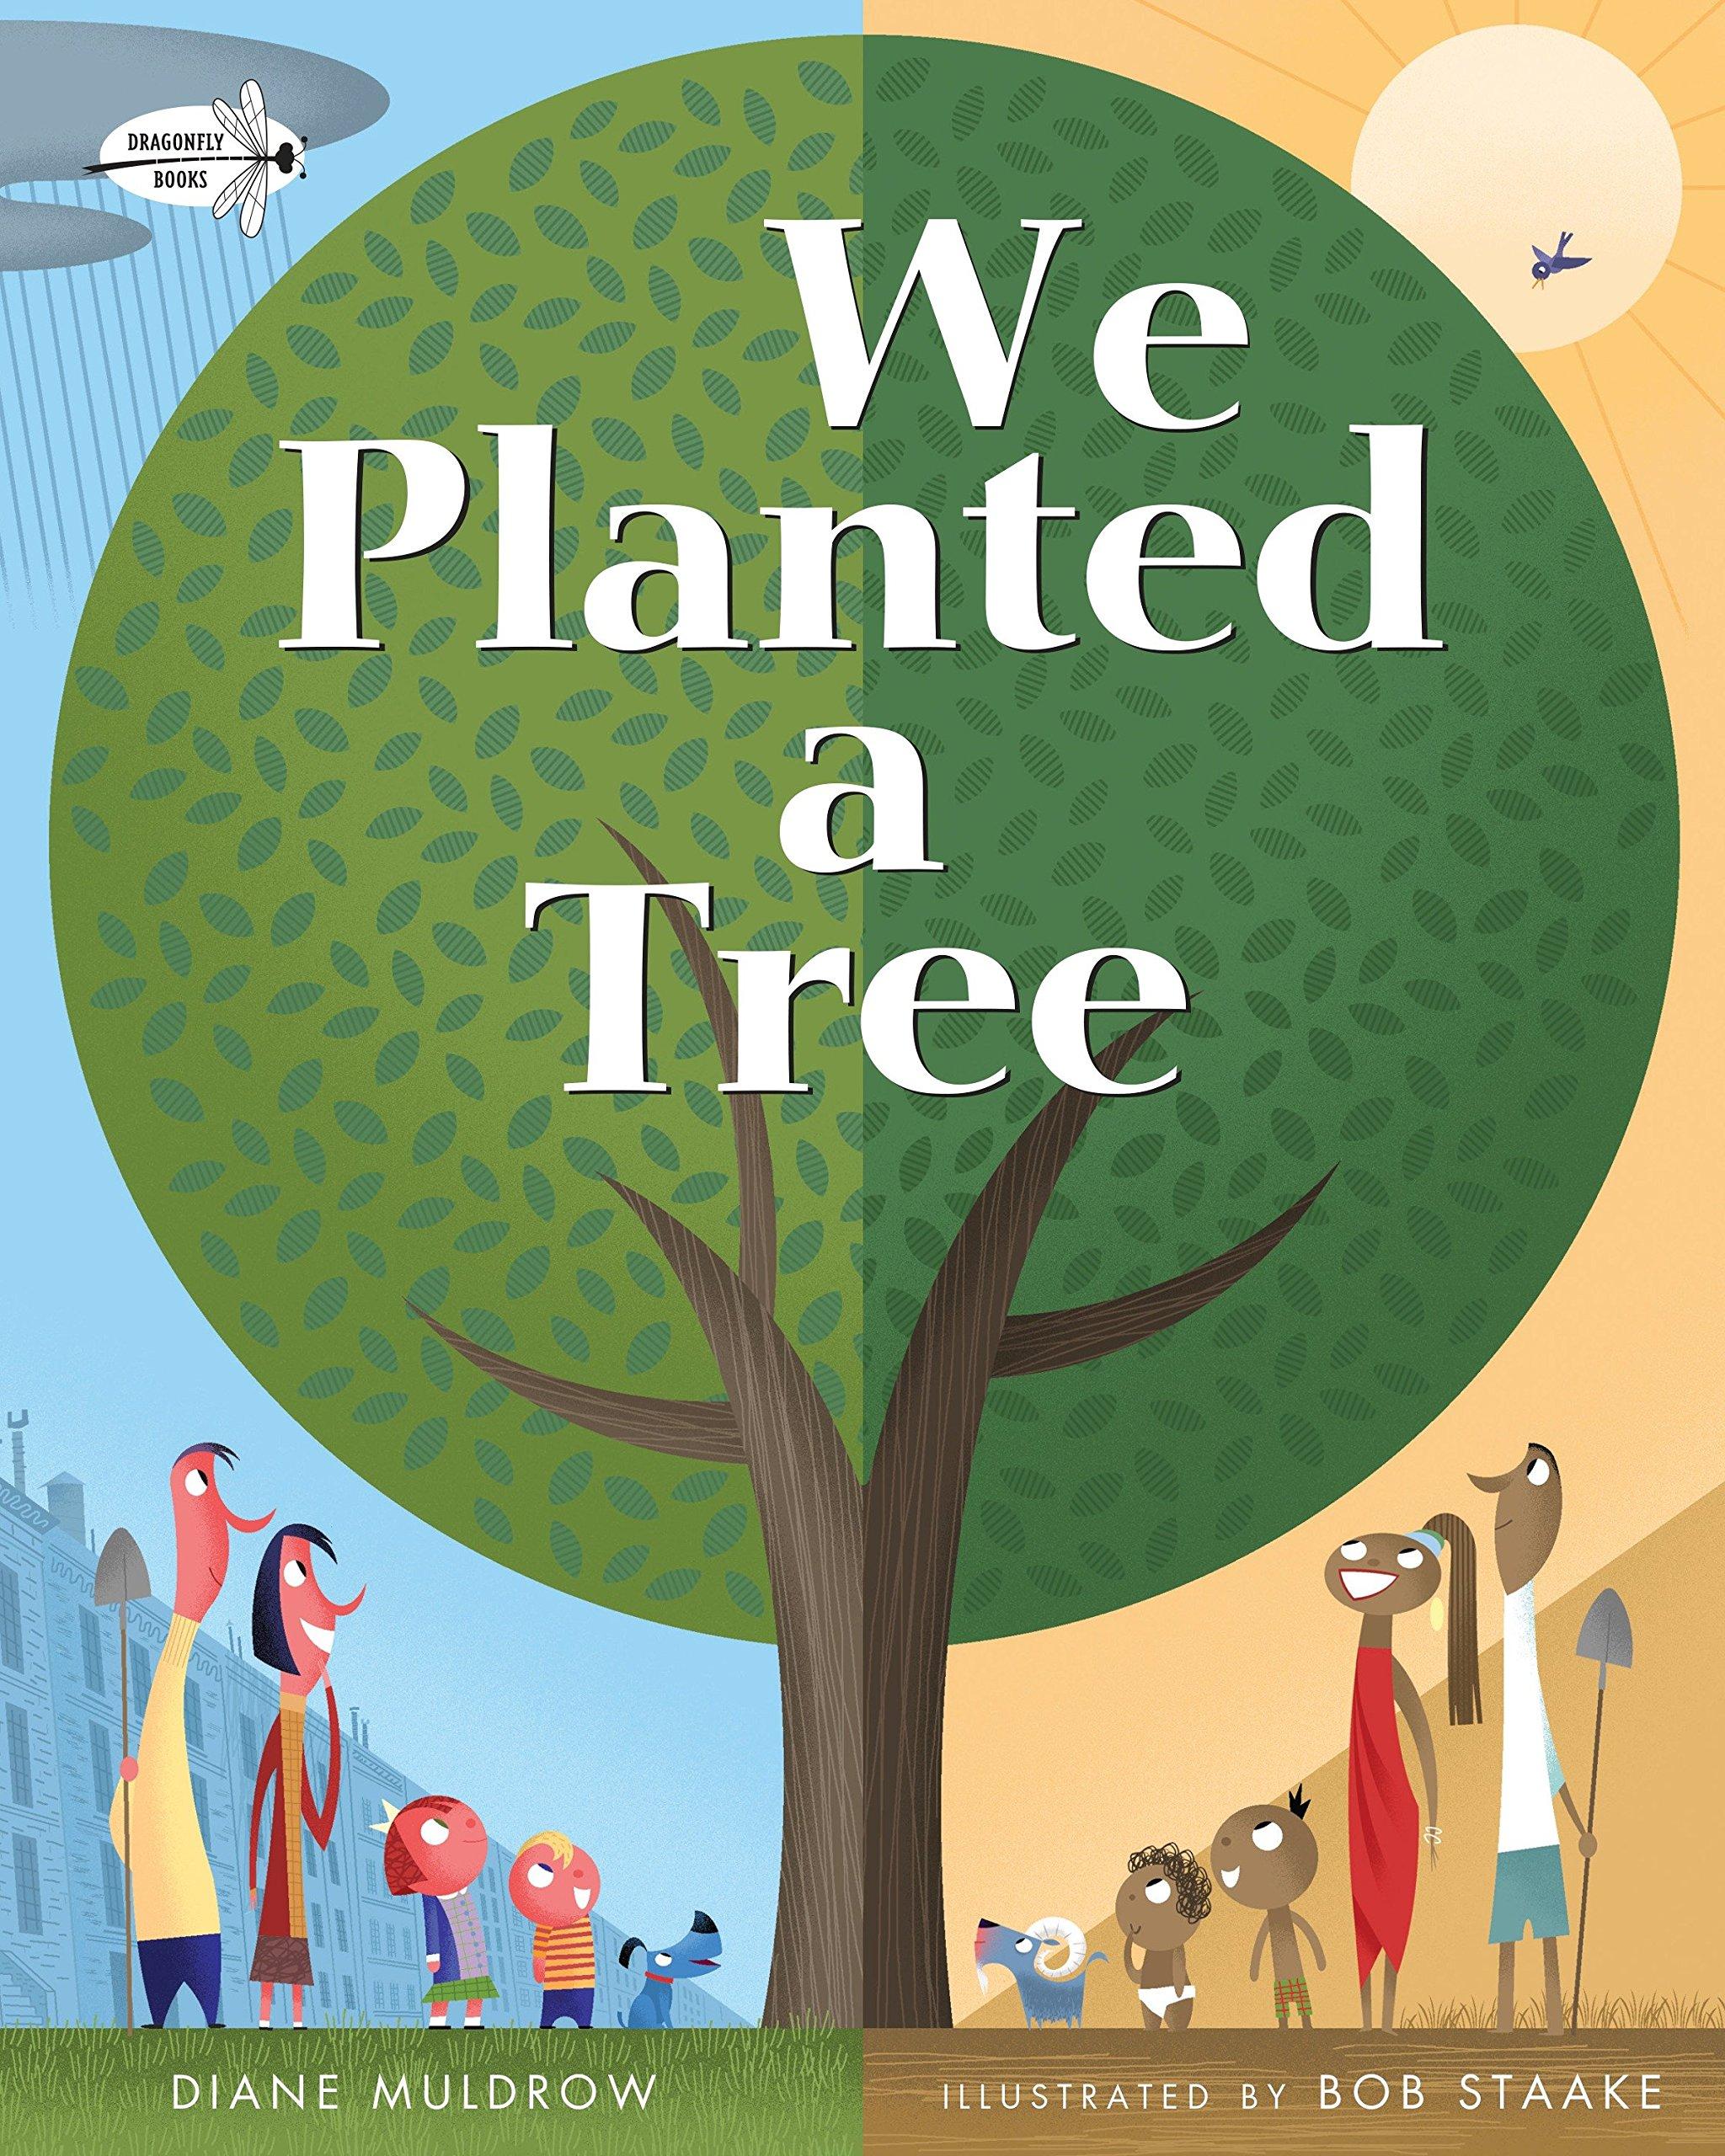 We Planted a Tree: Muldrow, Diane, Staake, Bob: 9780553539035: Amazon.com:  Books